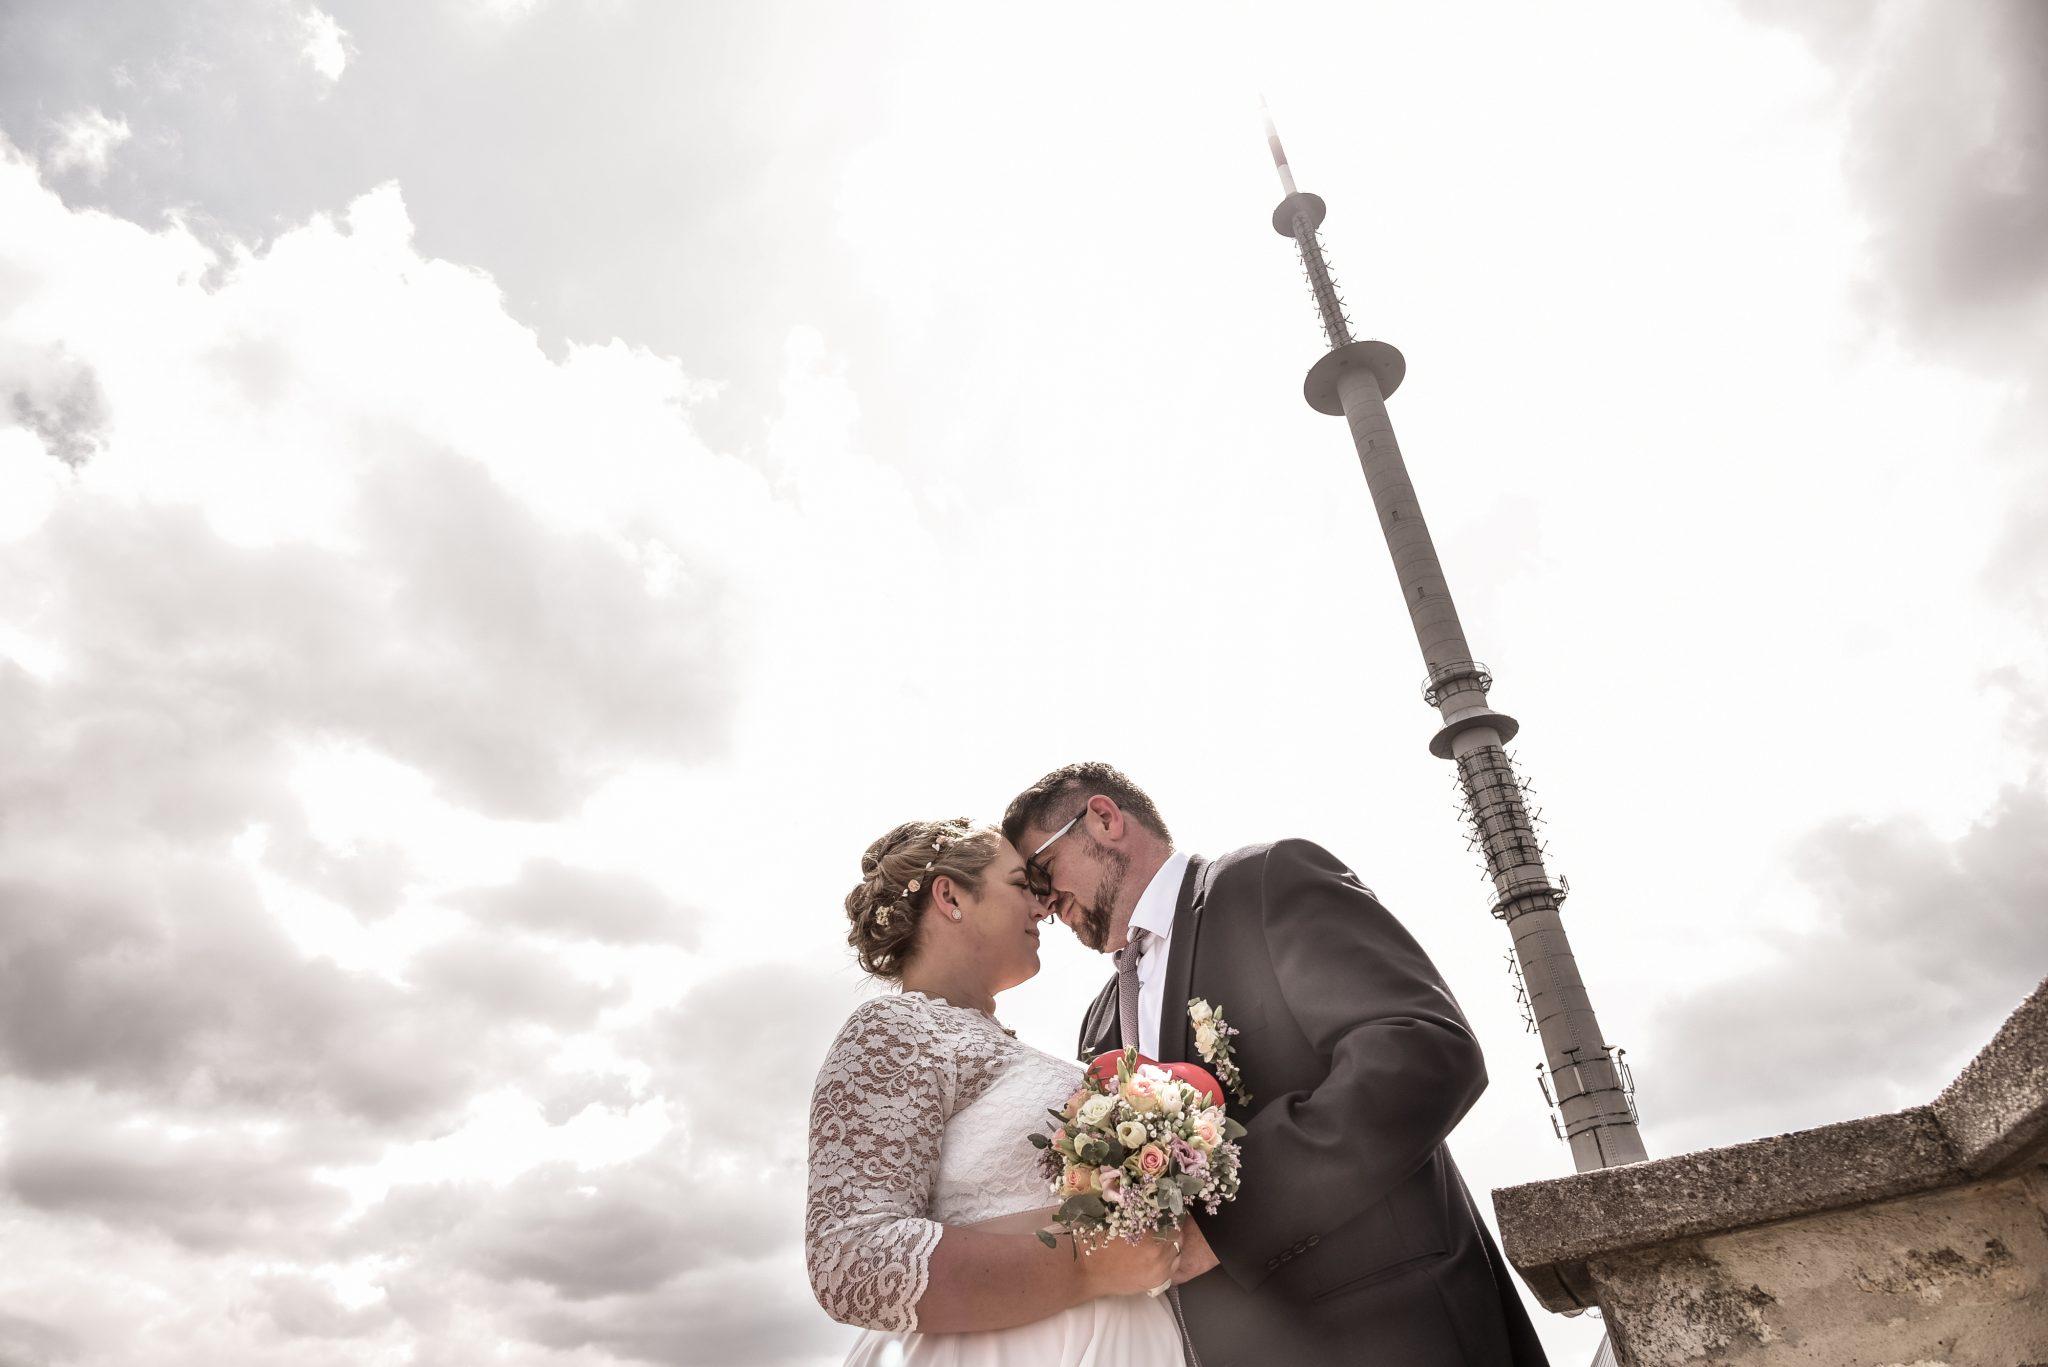 Hochzeitsfotos am Ochsenkopf Brautpaarshooting